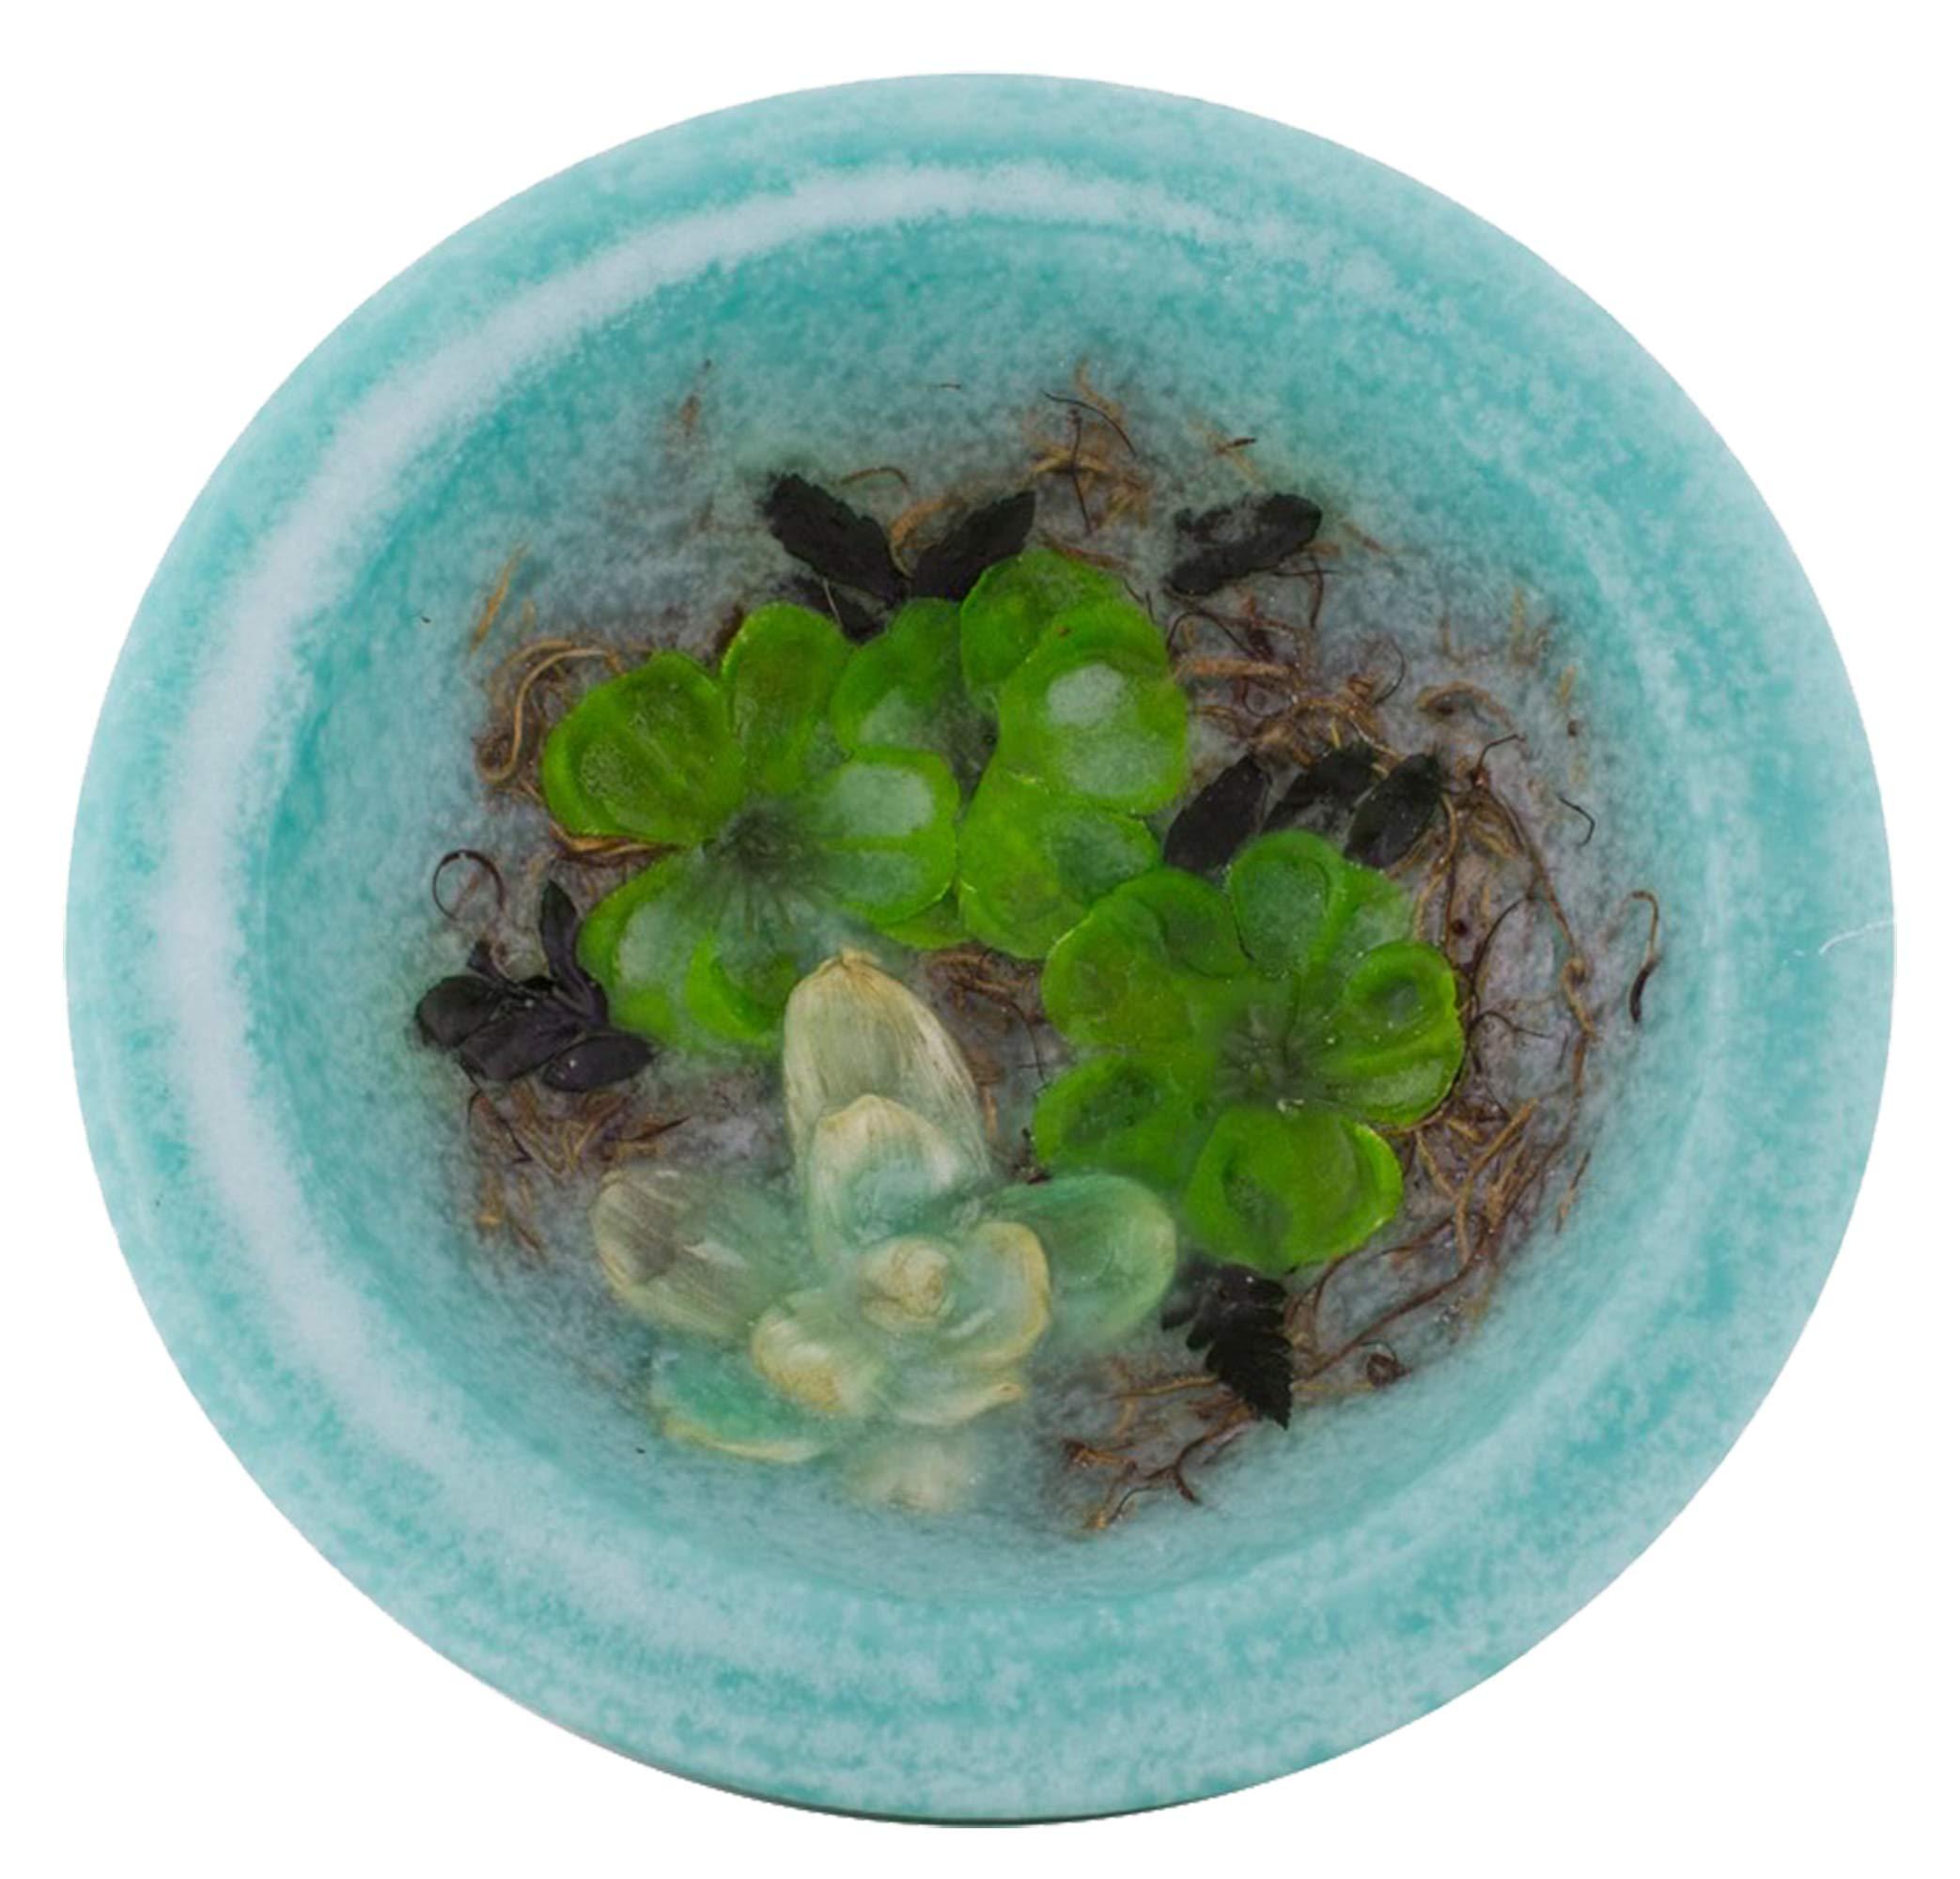 Habersham Gardenia Water Lily Personal Space Wax Pottery Vessel